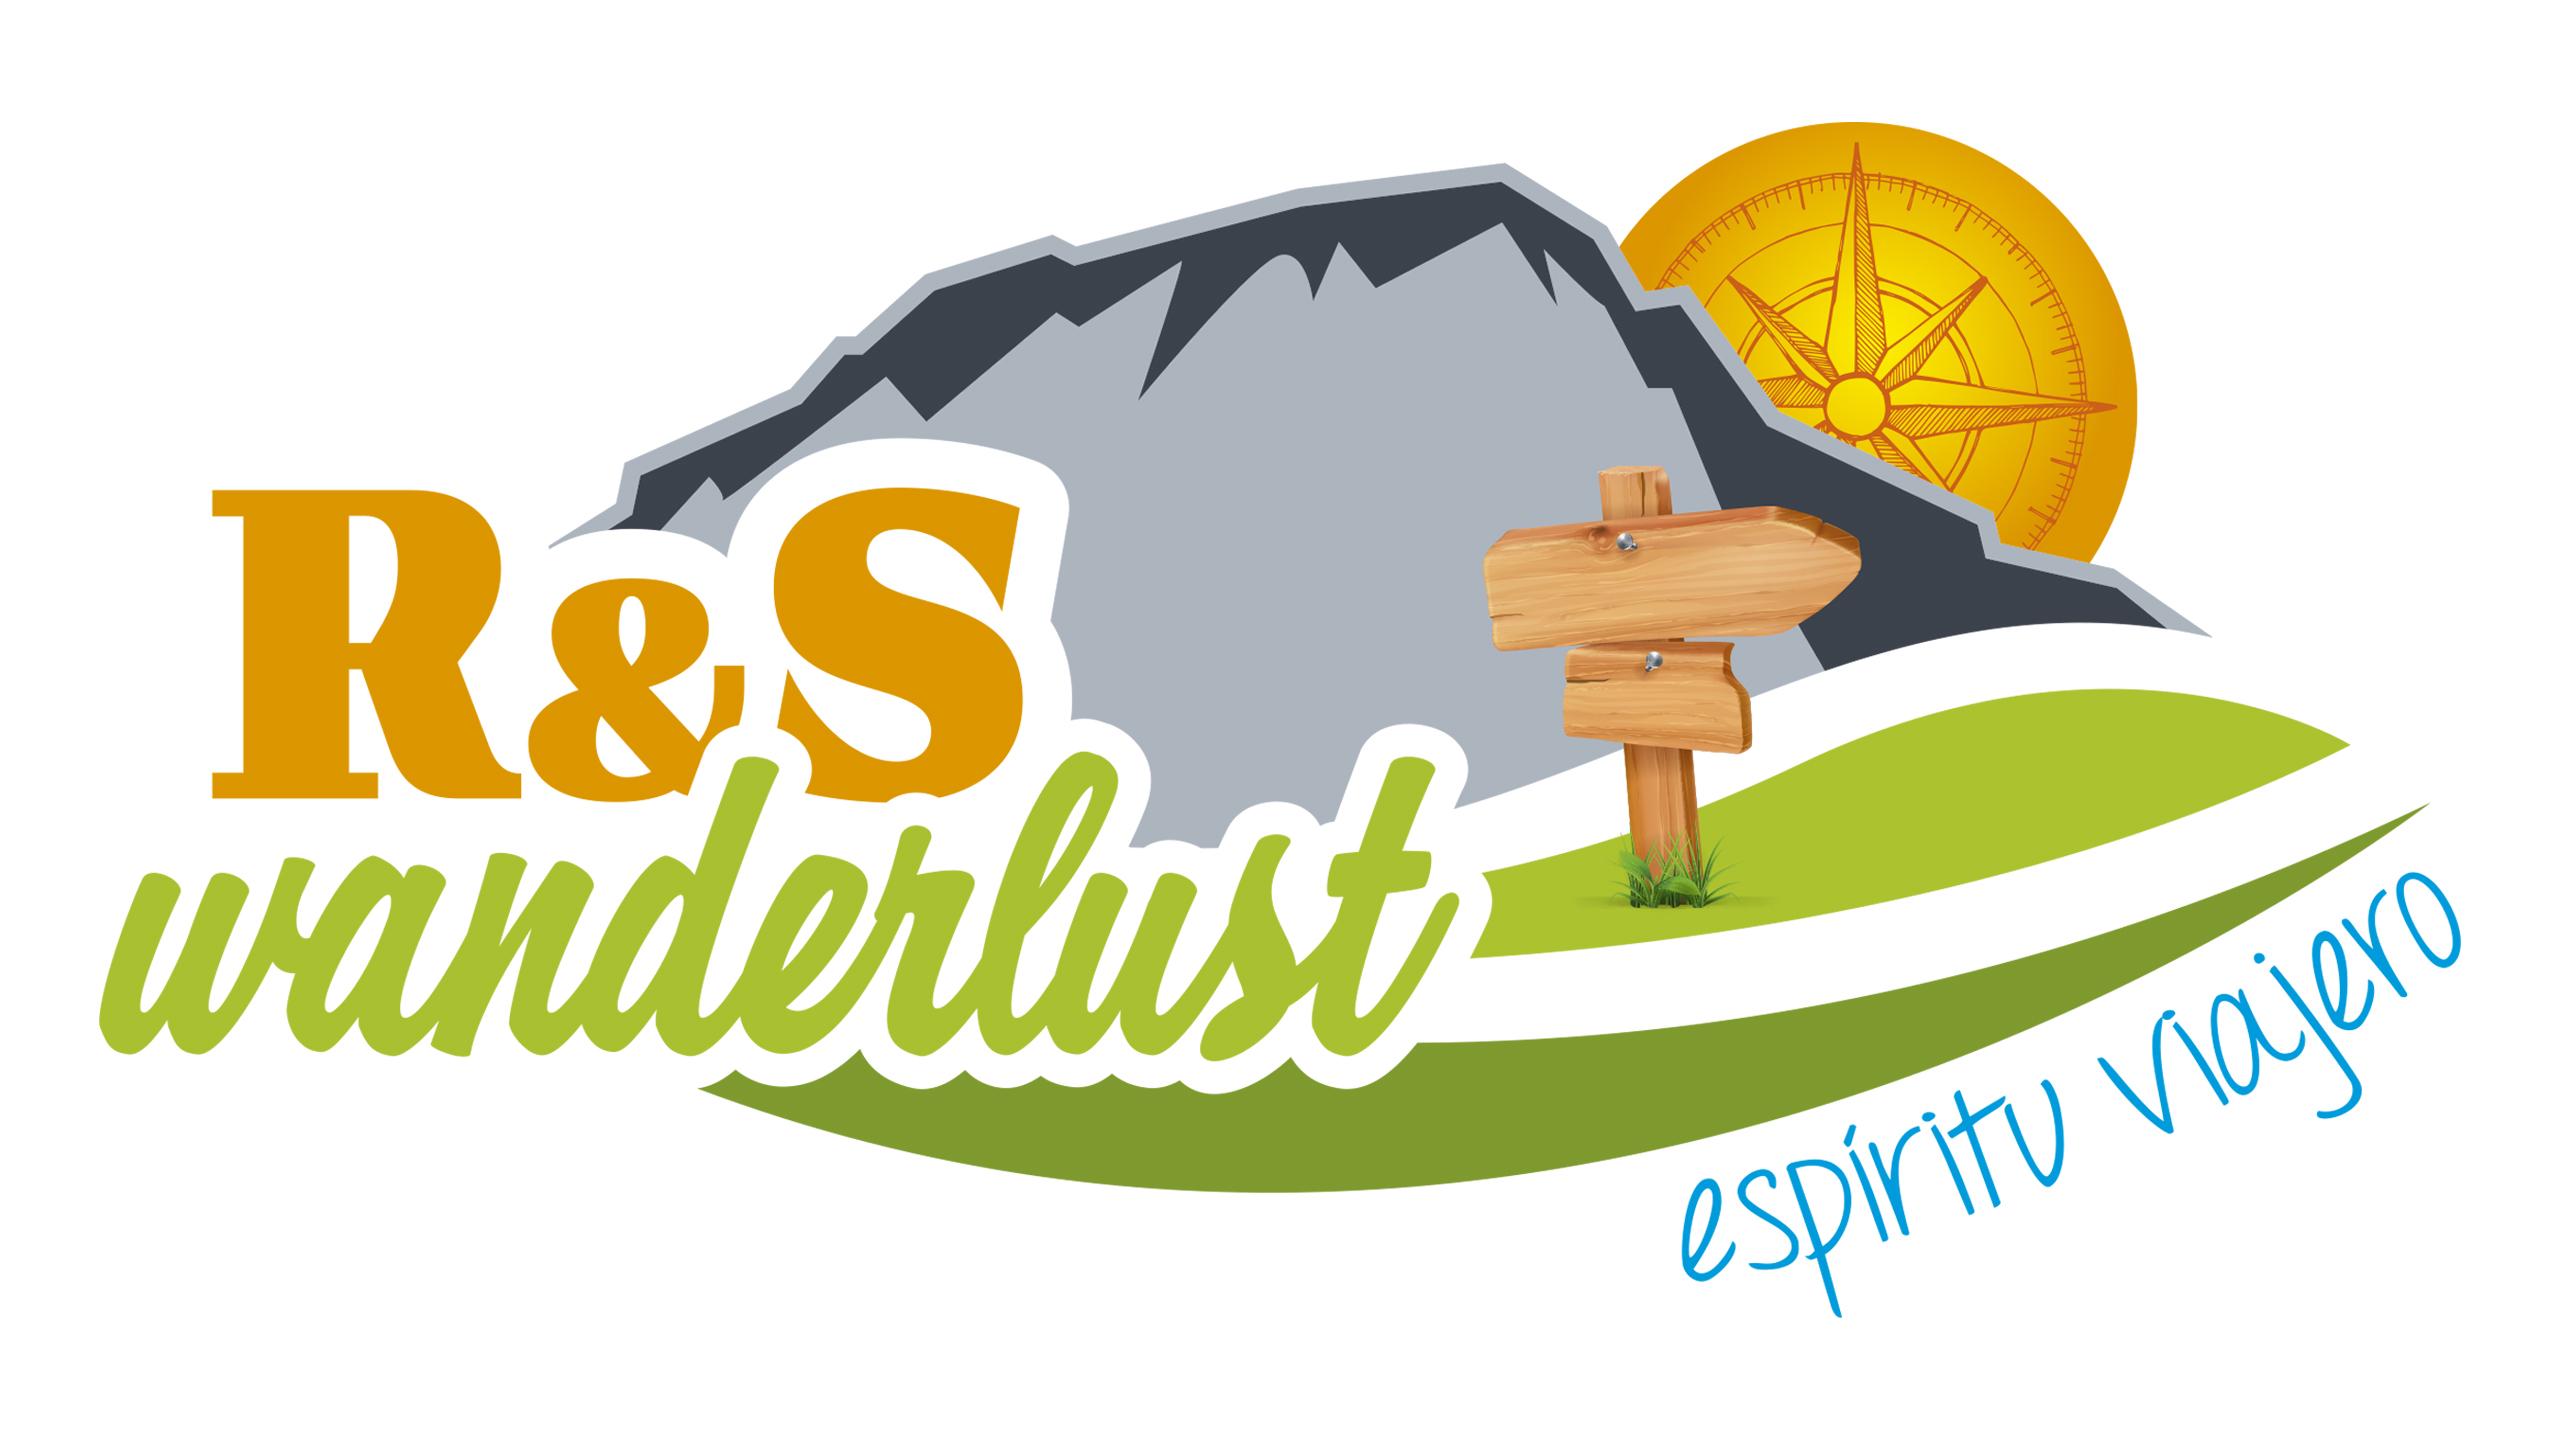 R&S Wanderlust